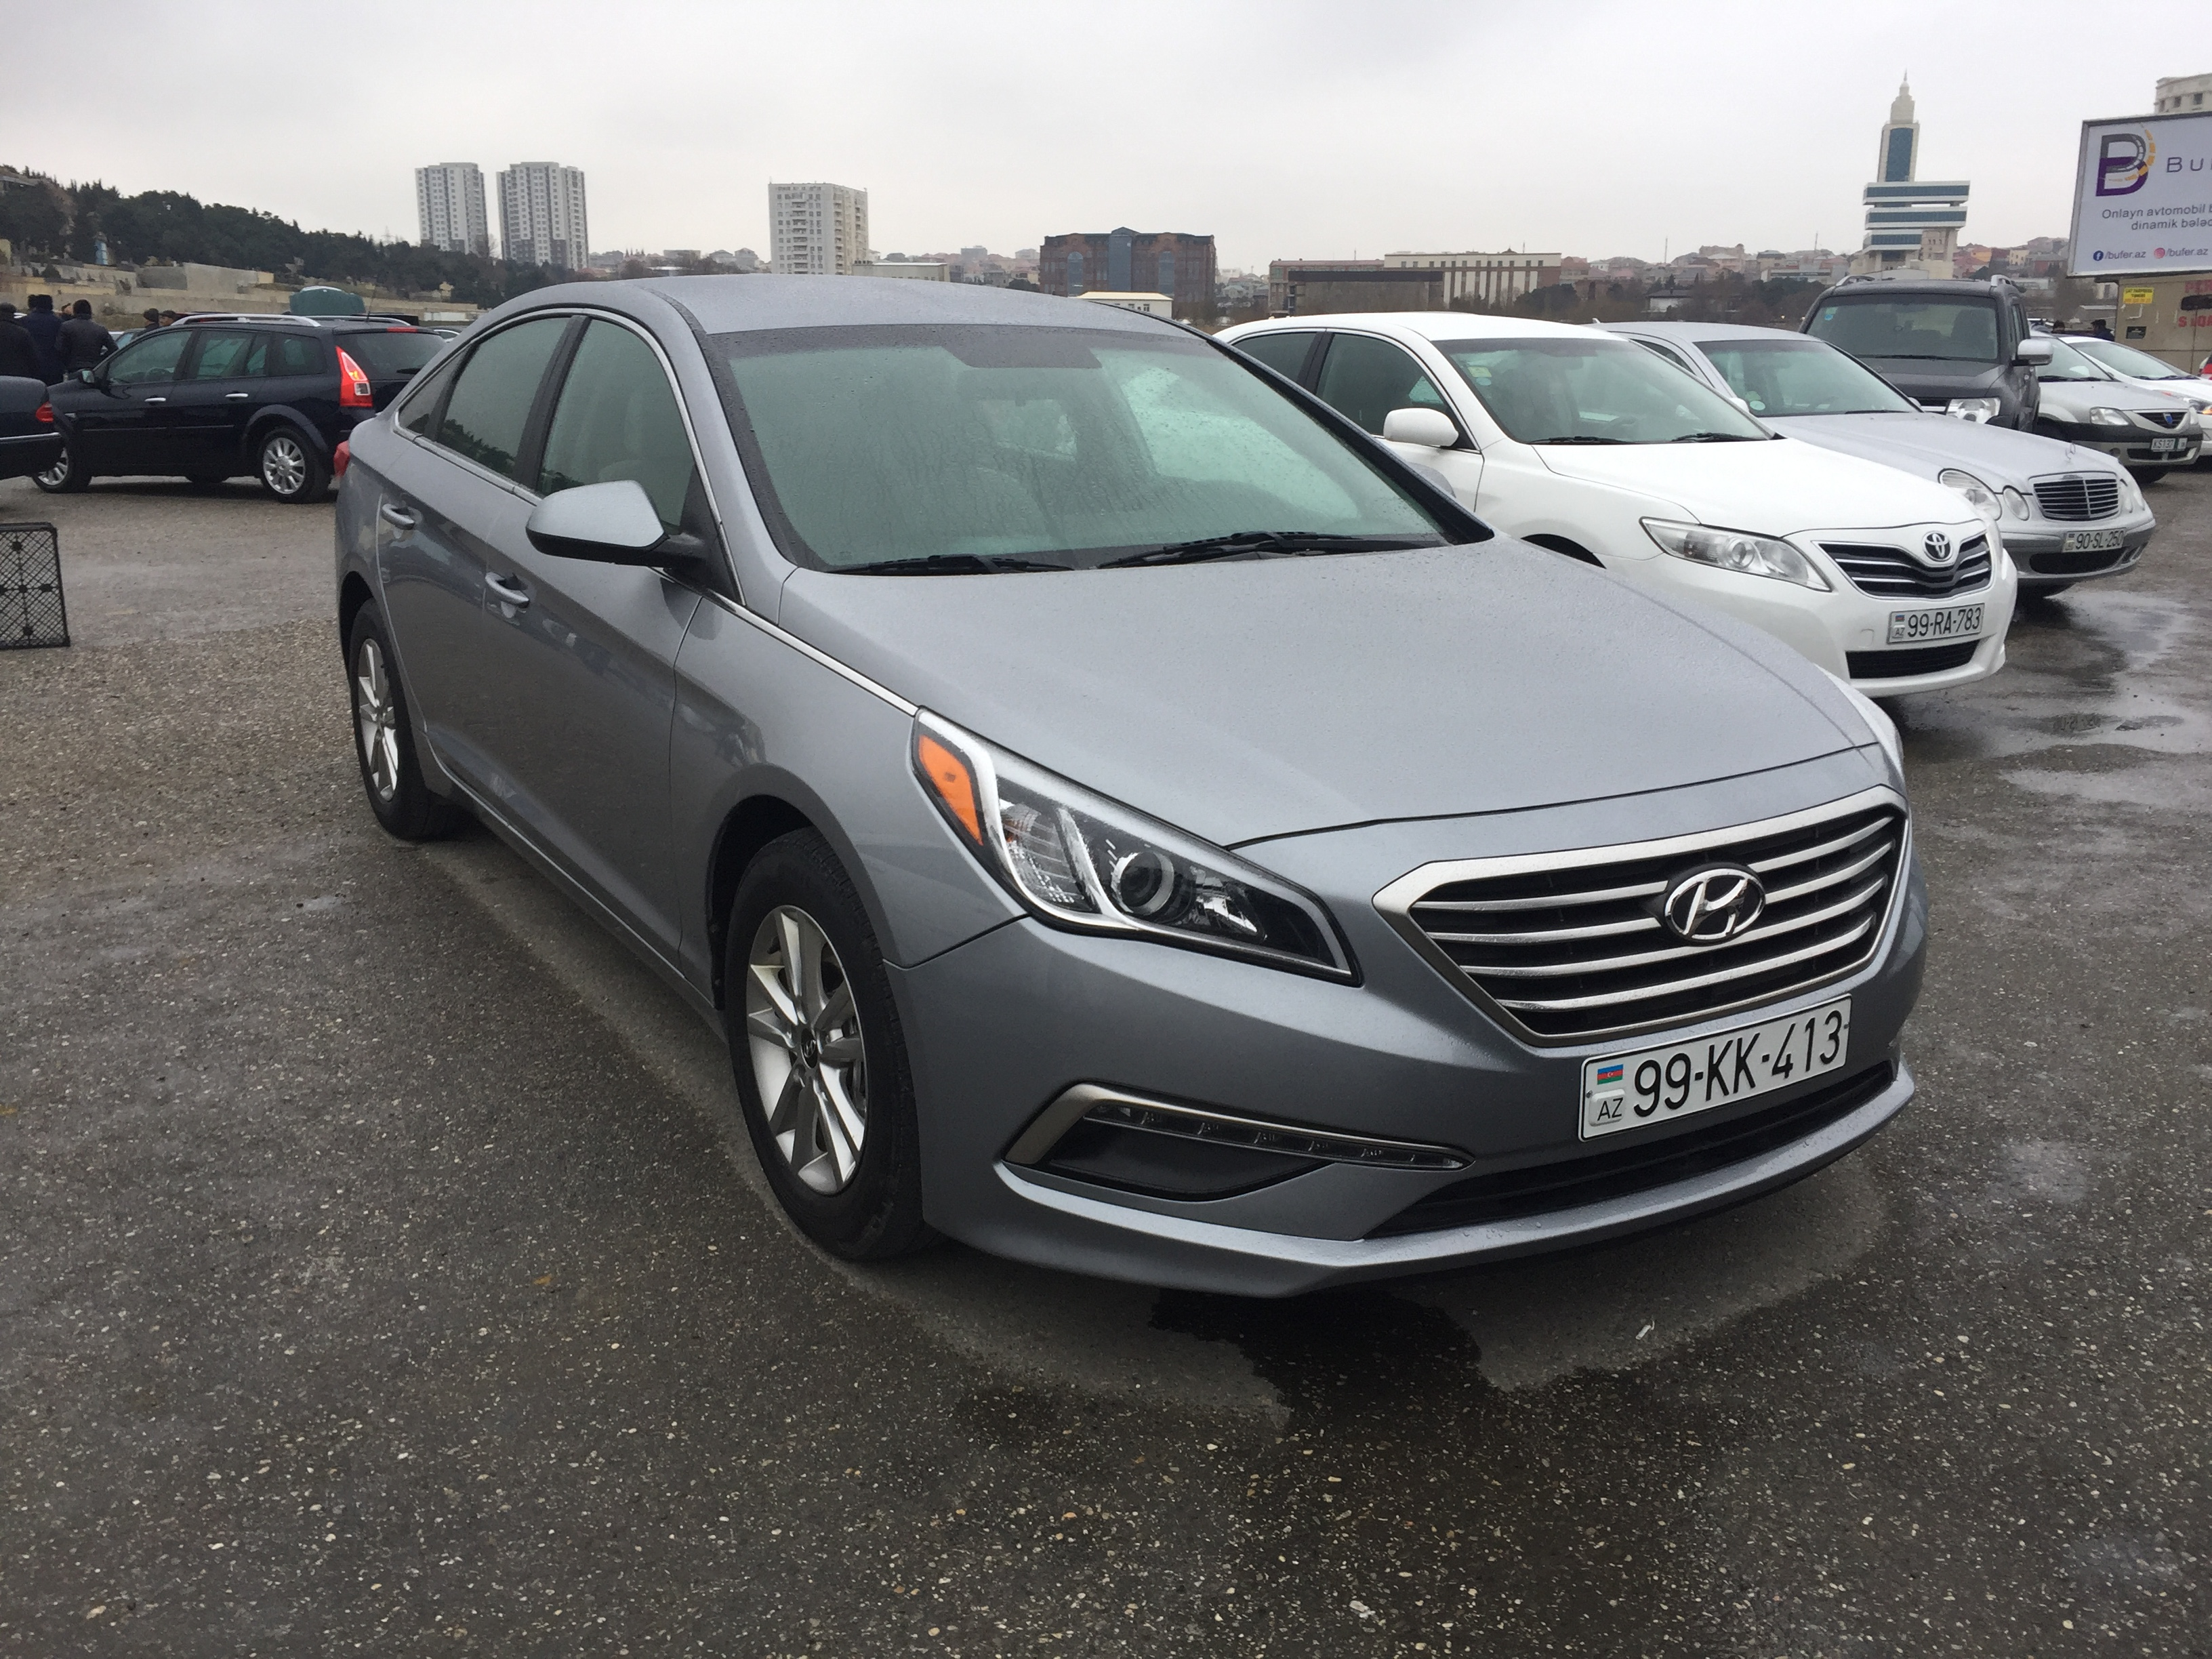 Hyundai Sonata 2.4(lt) 2014 İkinci əl  $23400